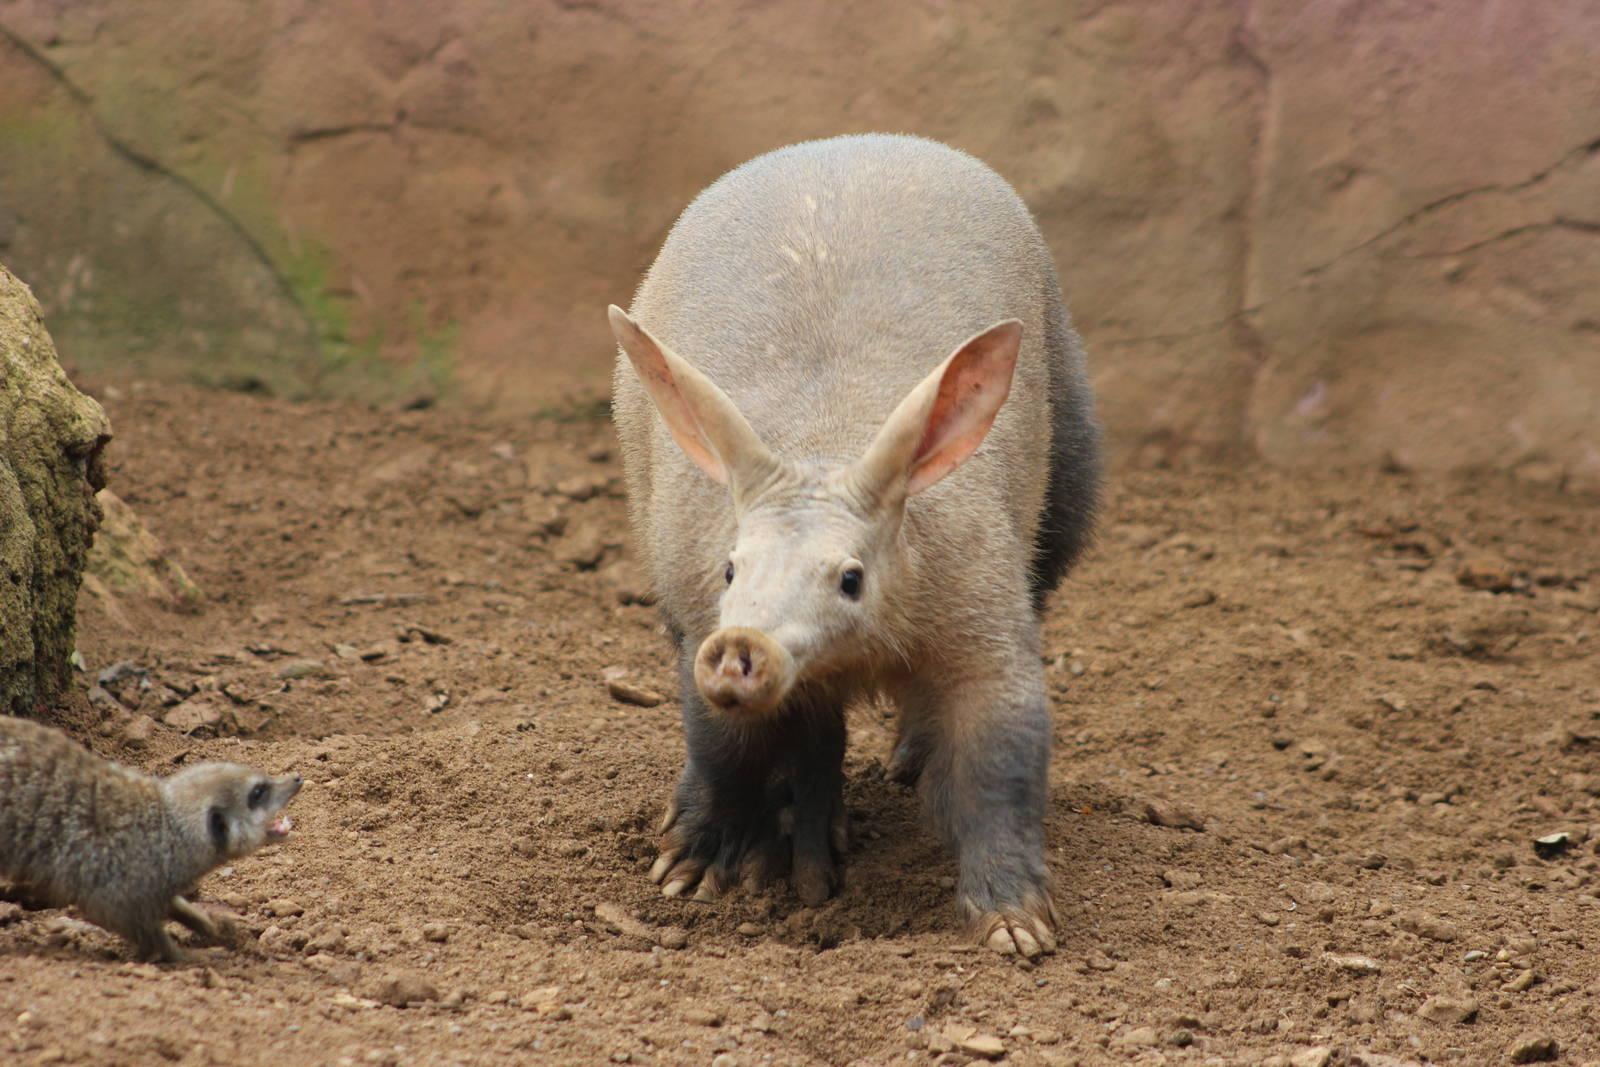 Aardvark wallpaper